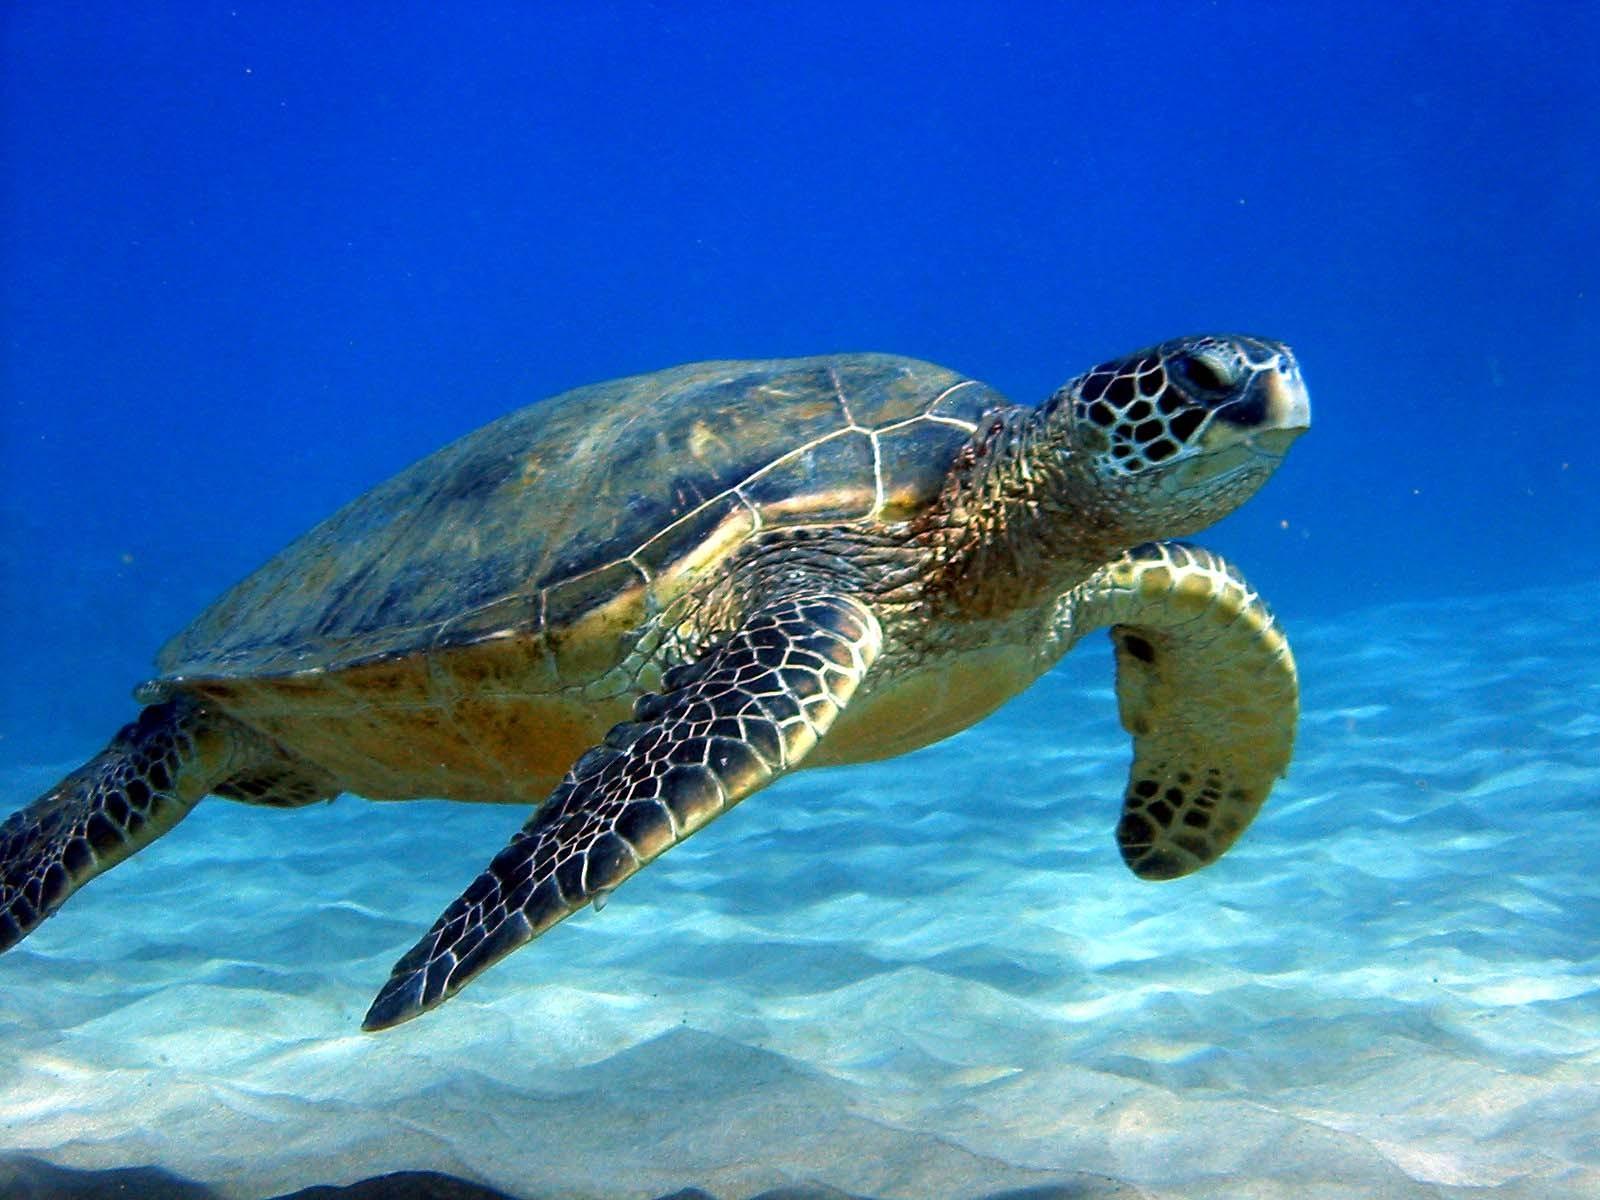 sea-turtle-hd-wallpaper_sister-from-below.jpg